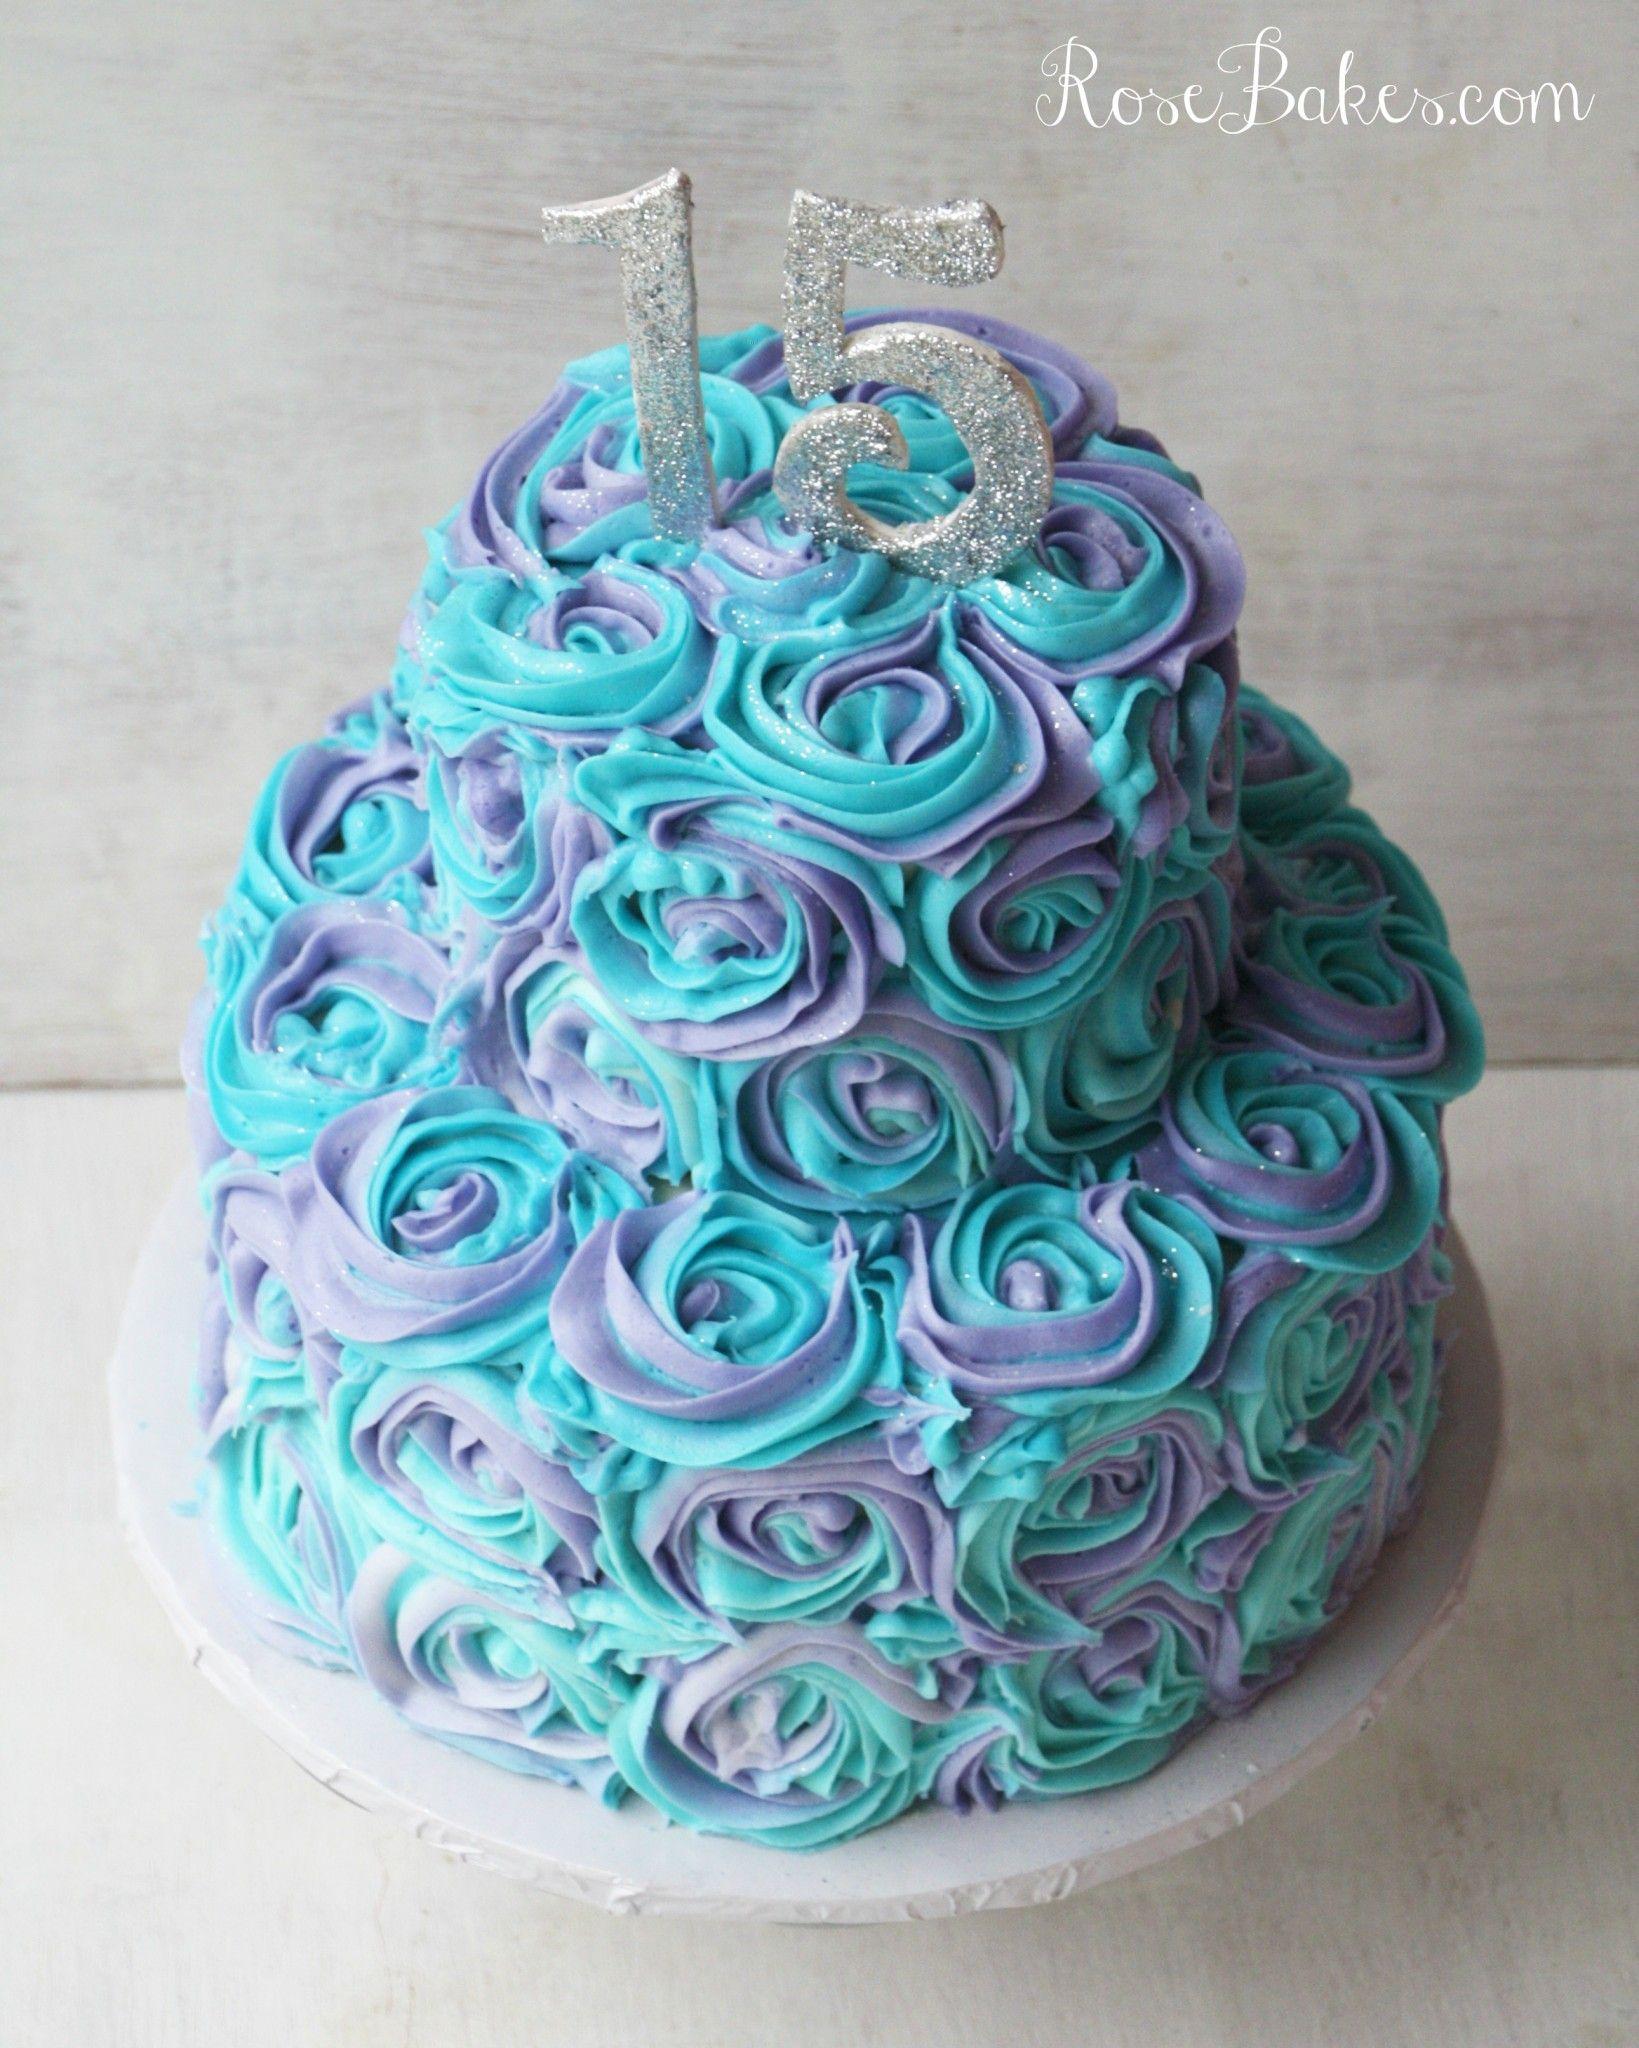 Teal Lavender Swirled Buttercream Roses 15th Birthday Cake 15th